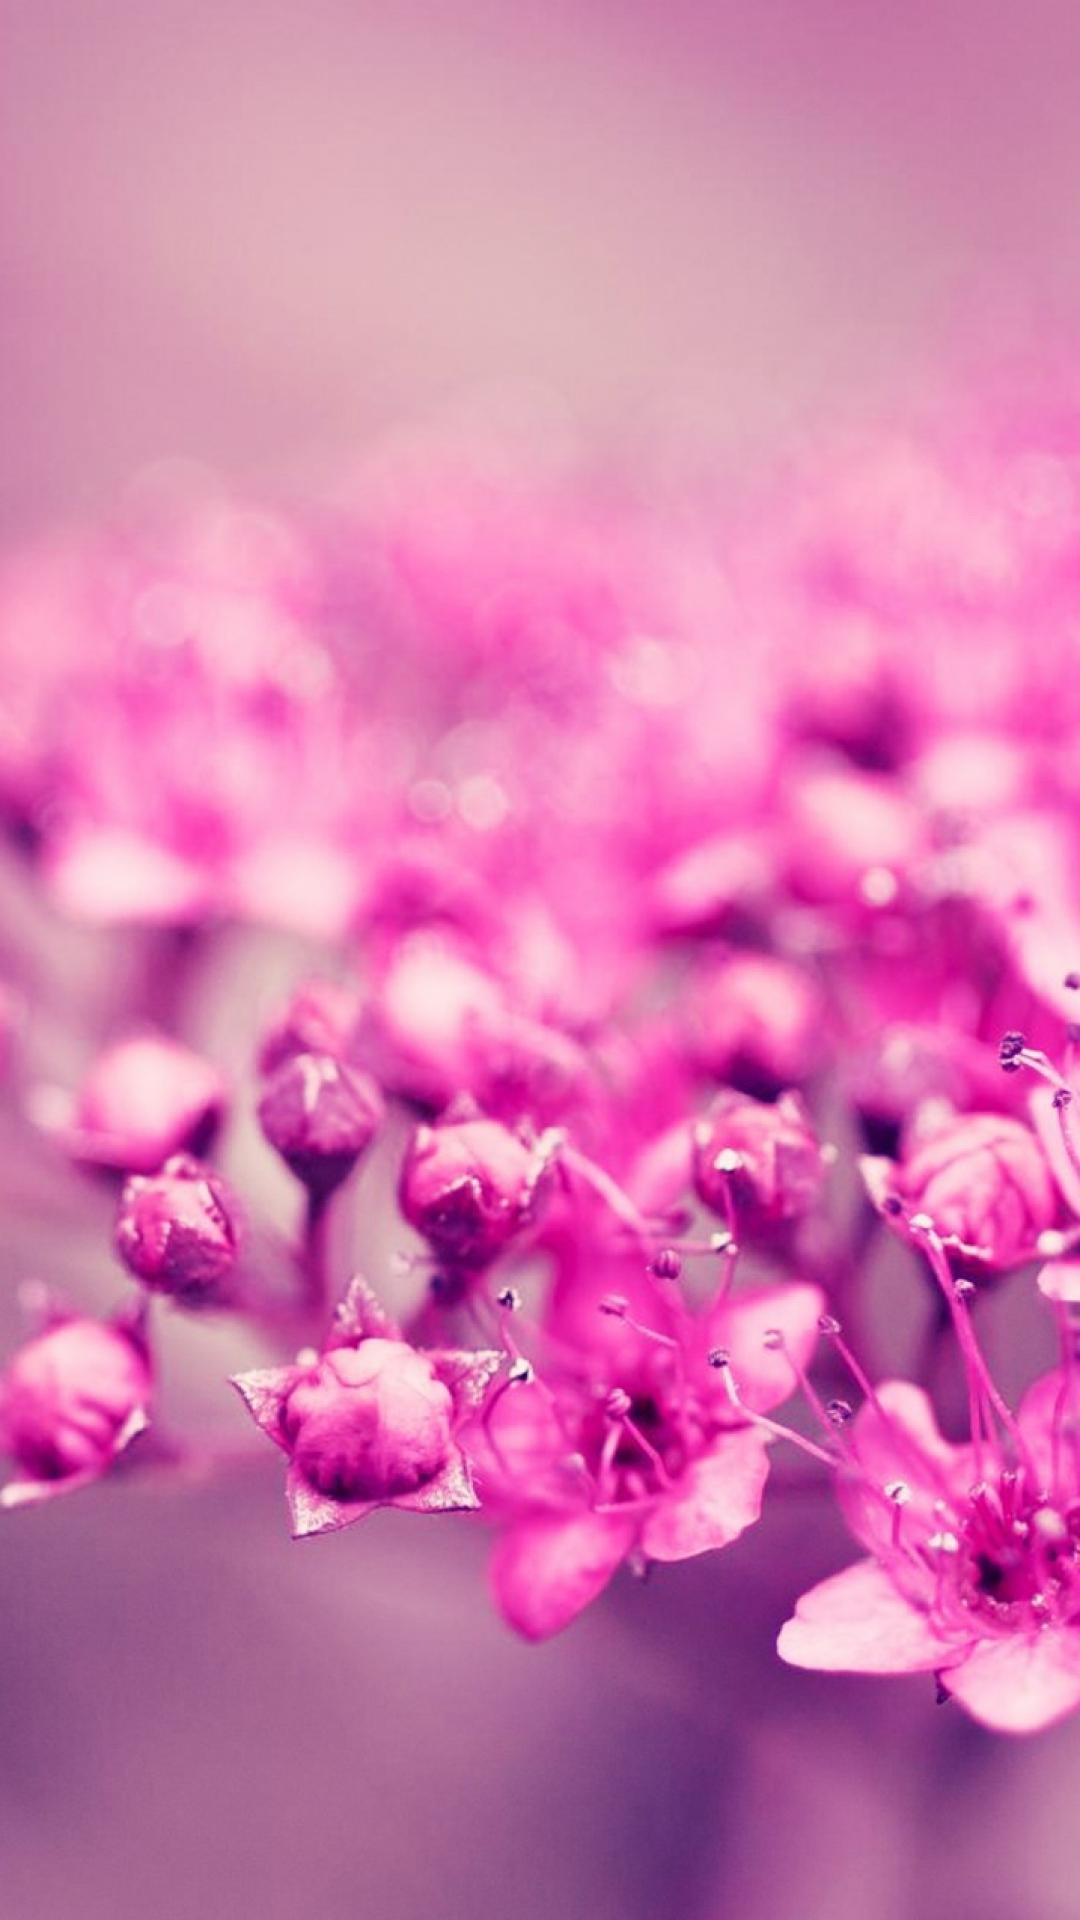 Rose Flower Hd Wallpaper Free Download Pink Flowers Summer Best Htc One Wallpapers